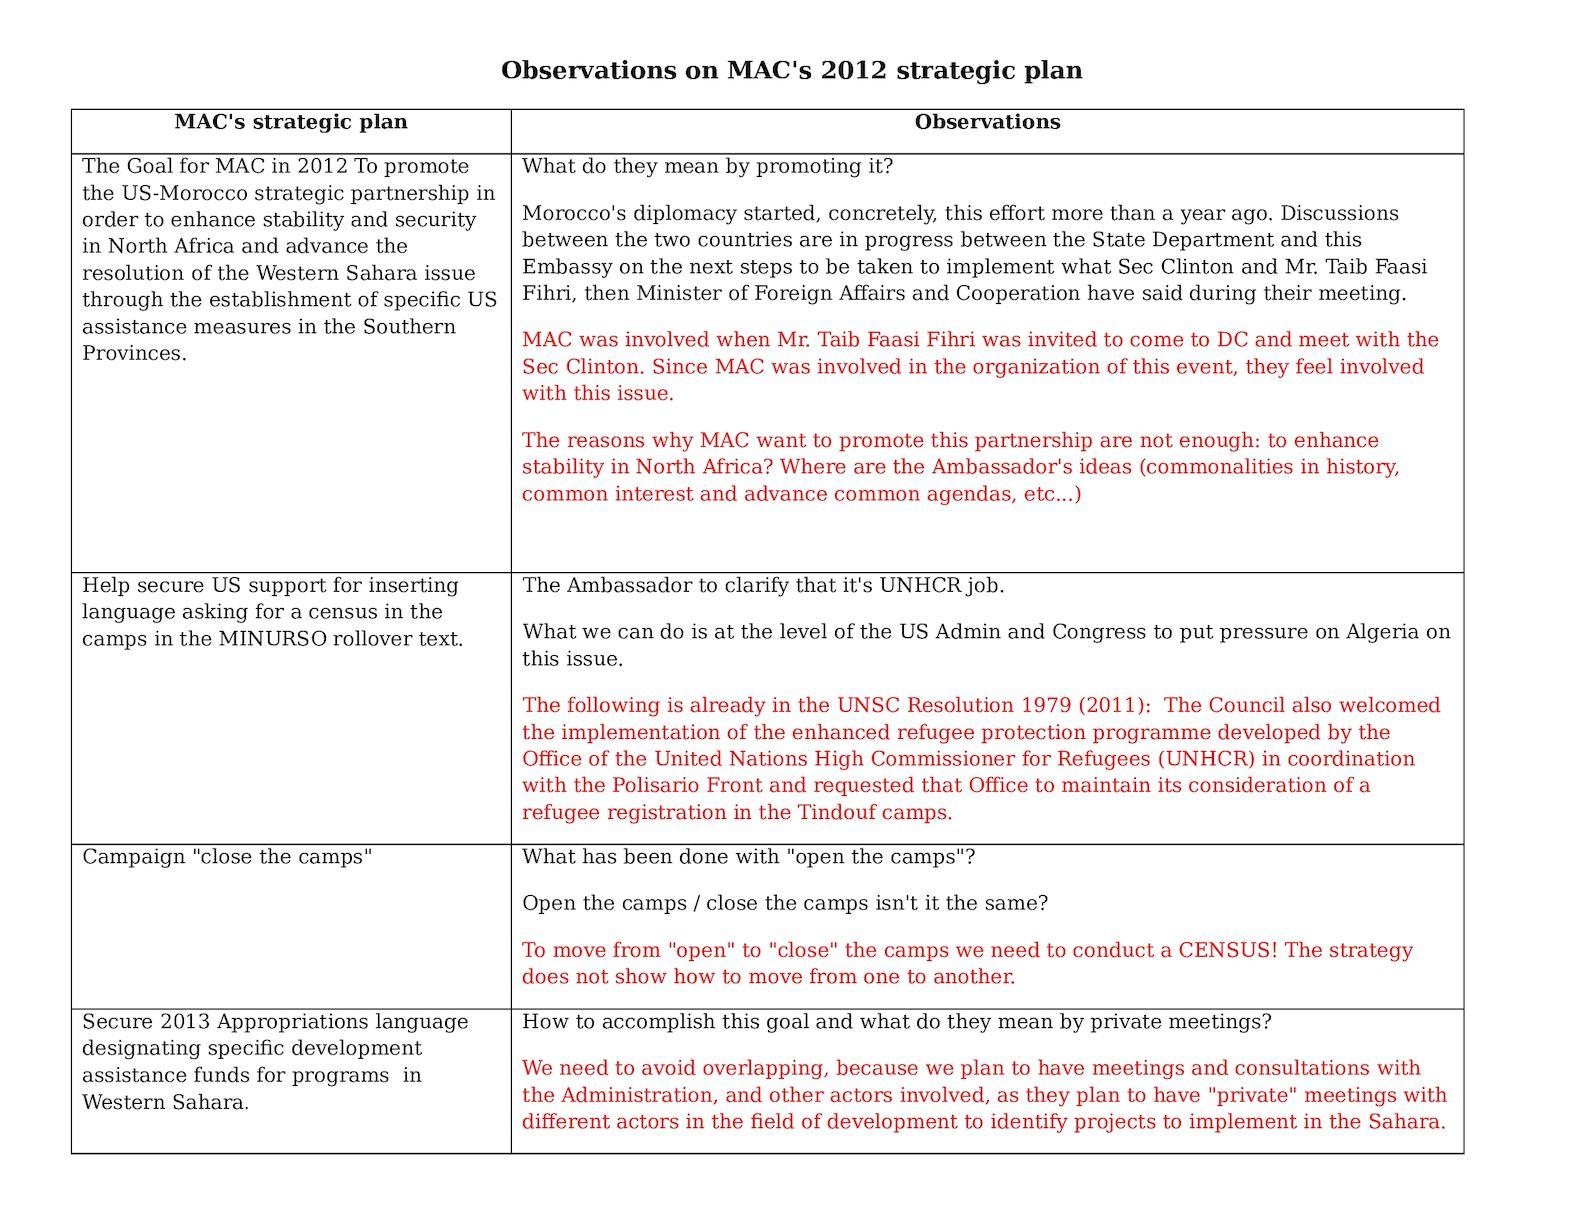 Observations On Mac's 2012 Strategic Plan